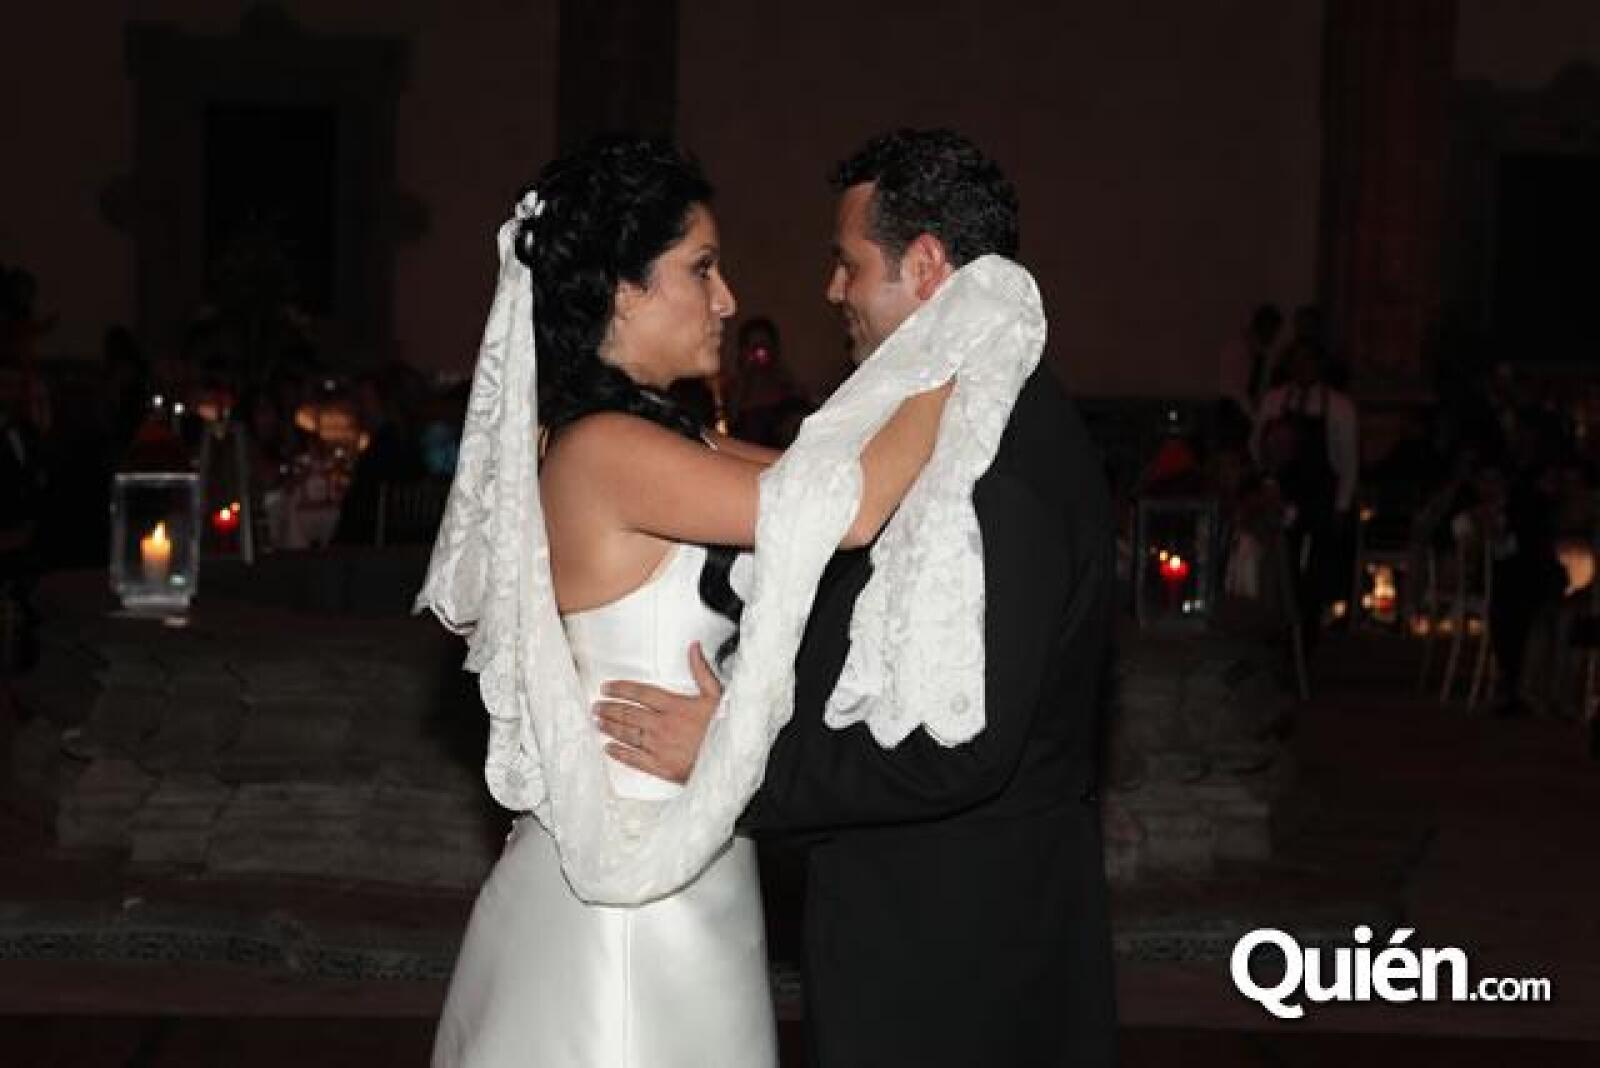 Danielle Dithurbide, Guillermo Ochoa